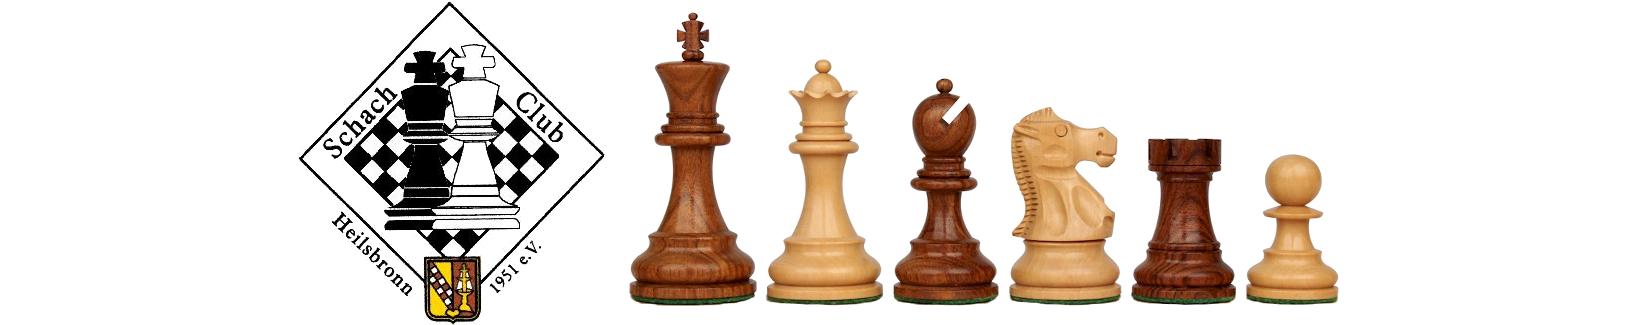 Schachclub 1951 Heilsbronn e.V.